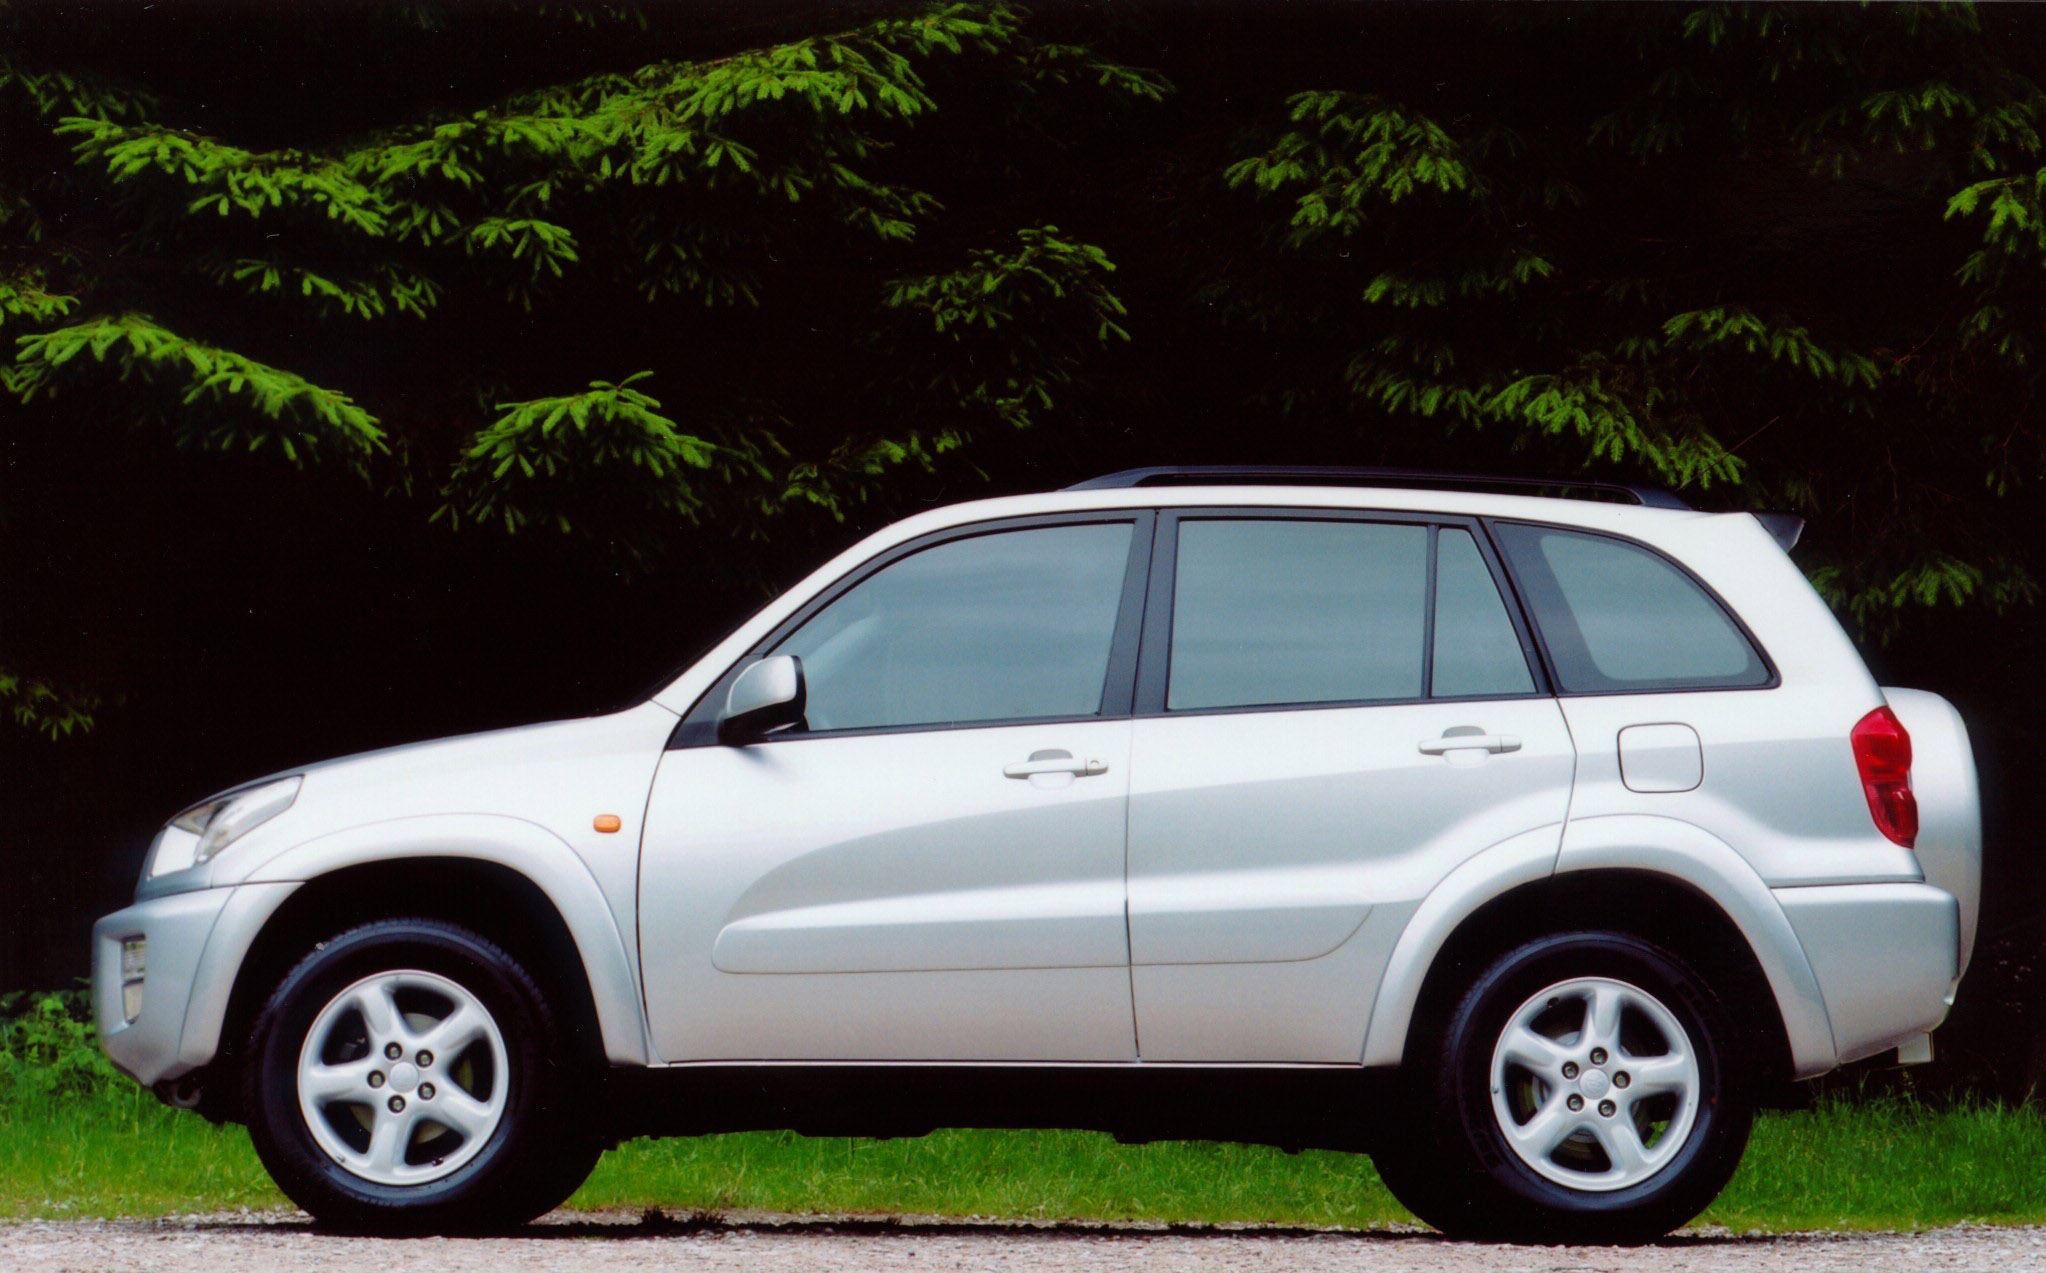 2000 Toyota Rav4 Picture 76787